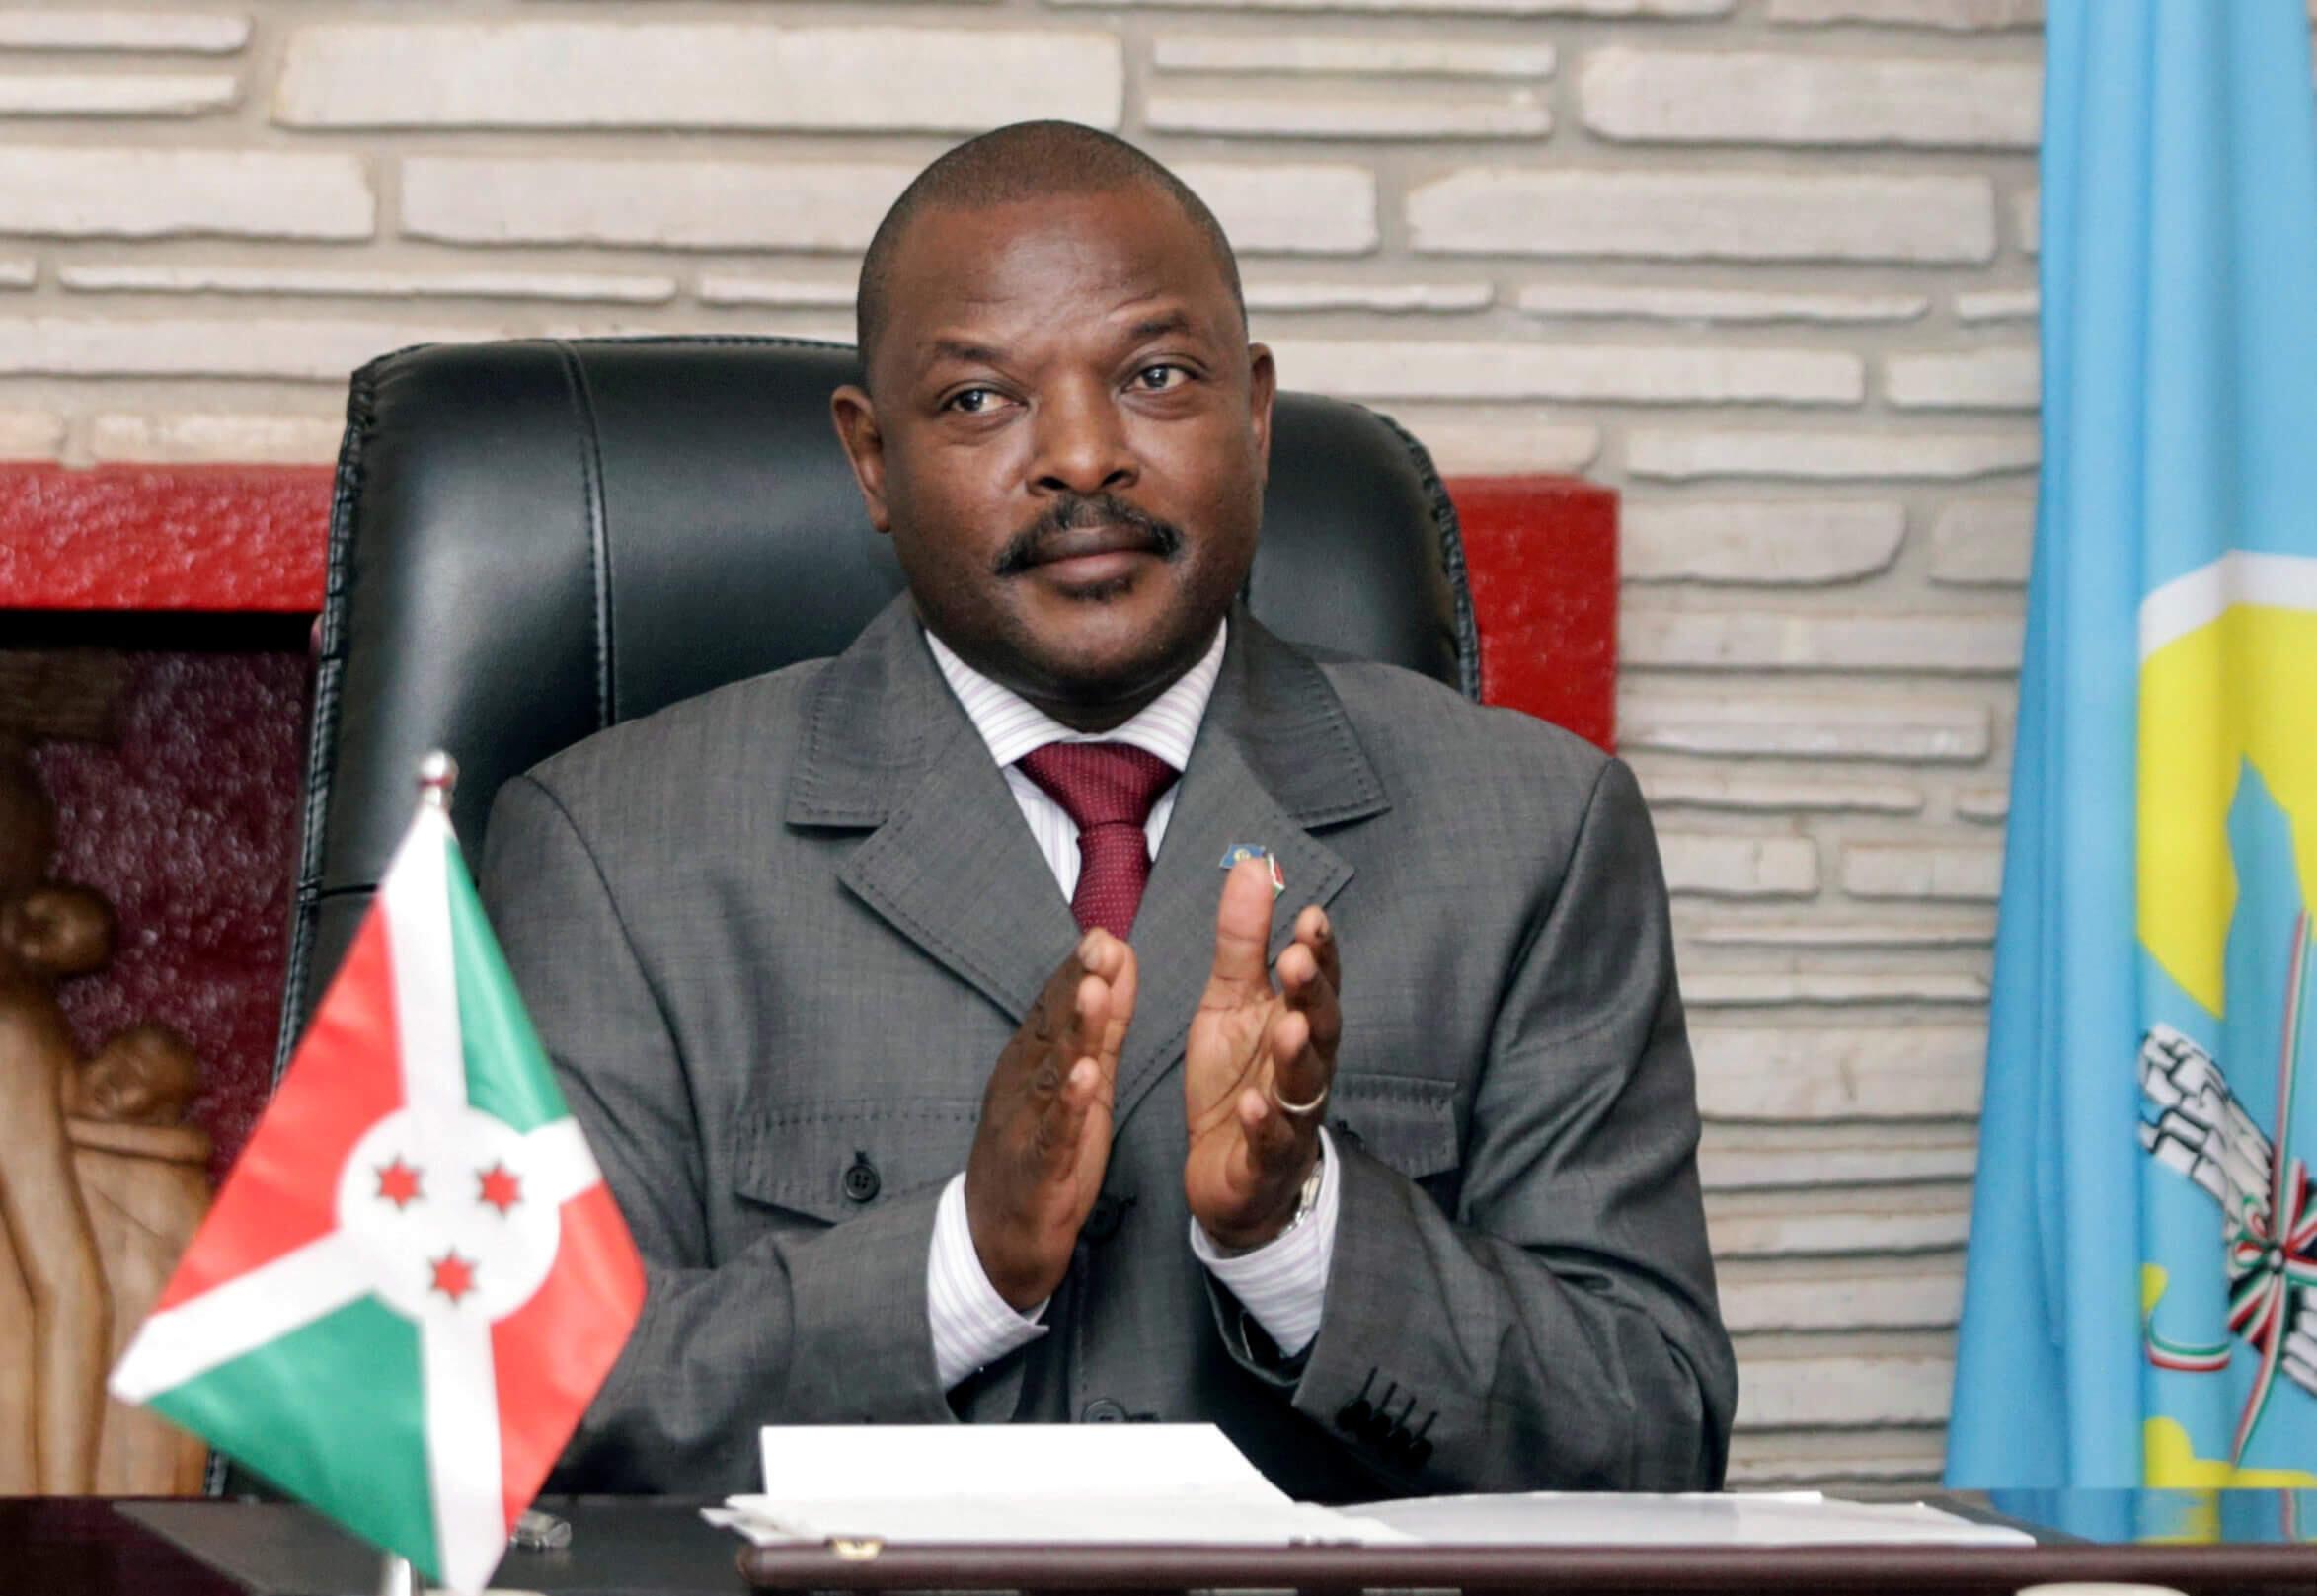 O Presidente cessante do Burundi, Pierre Nkurunziza, faleceu no dia 8 de Junho 2020